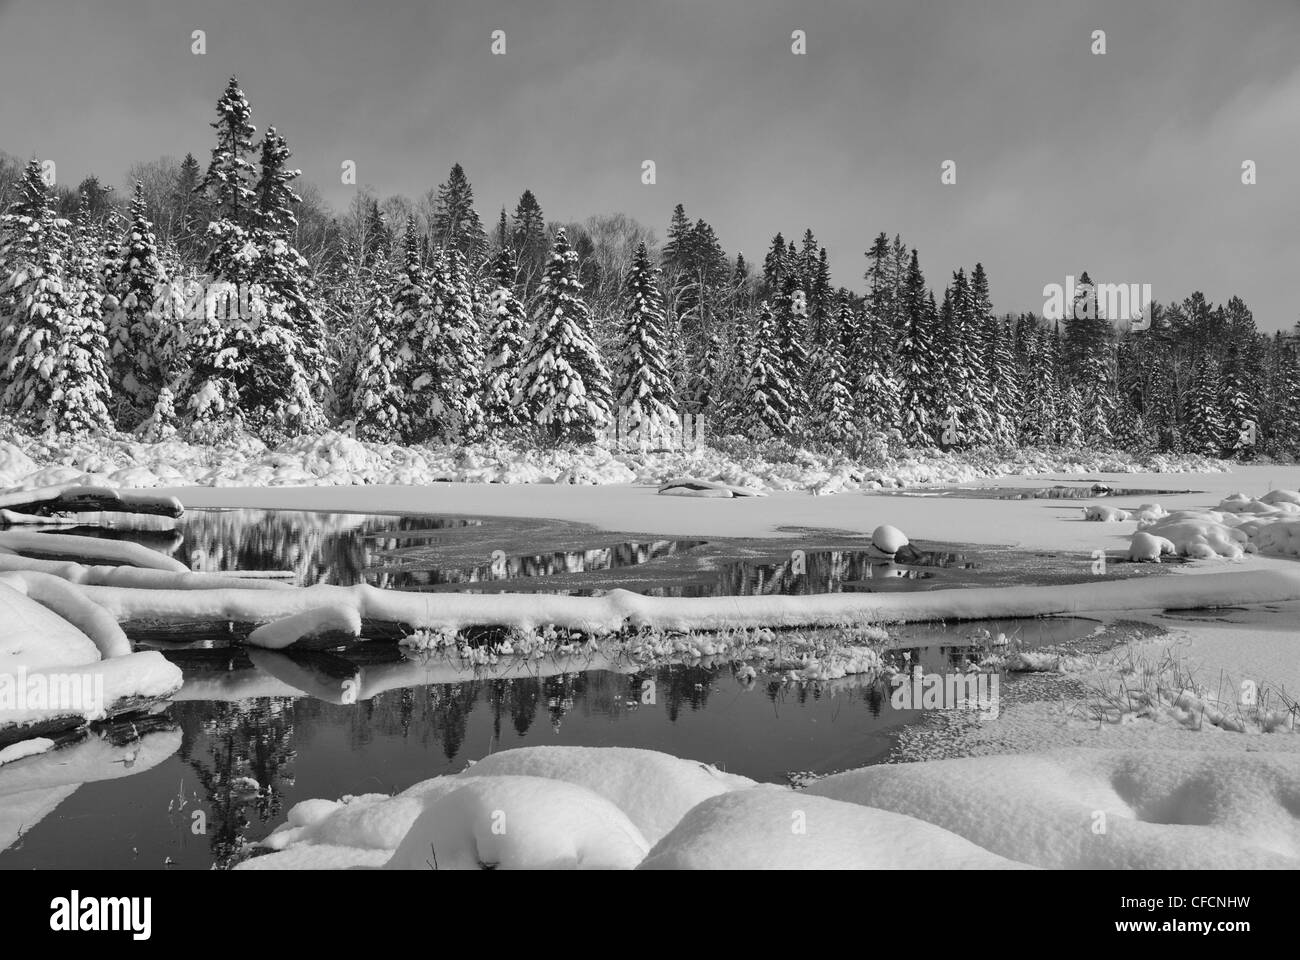 Fresco di neve caduti in una bellissima naturale scena invernale di Algonquin Park, Ontraio canada Immagini Stock